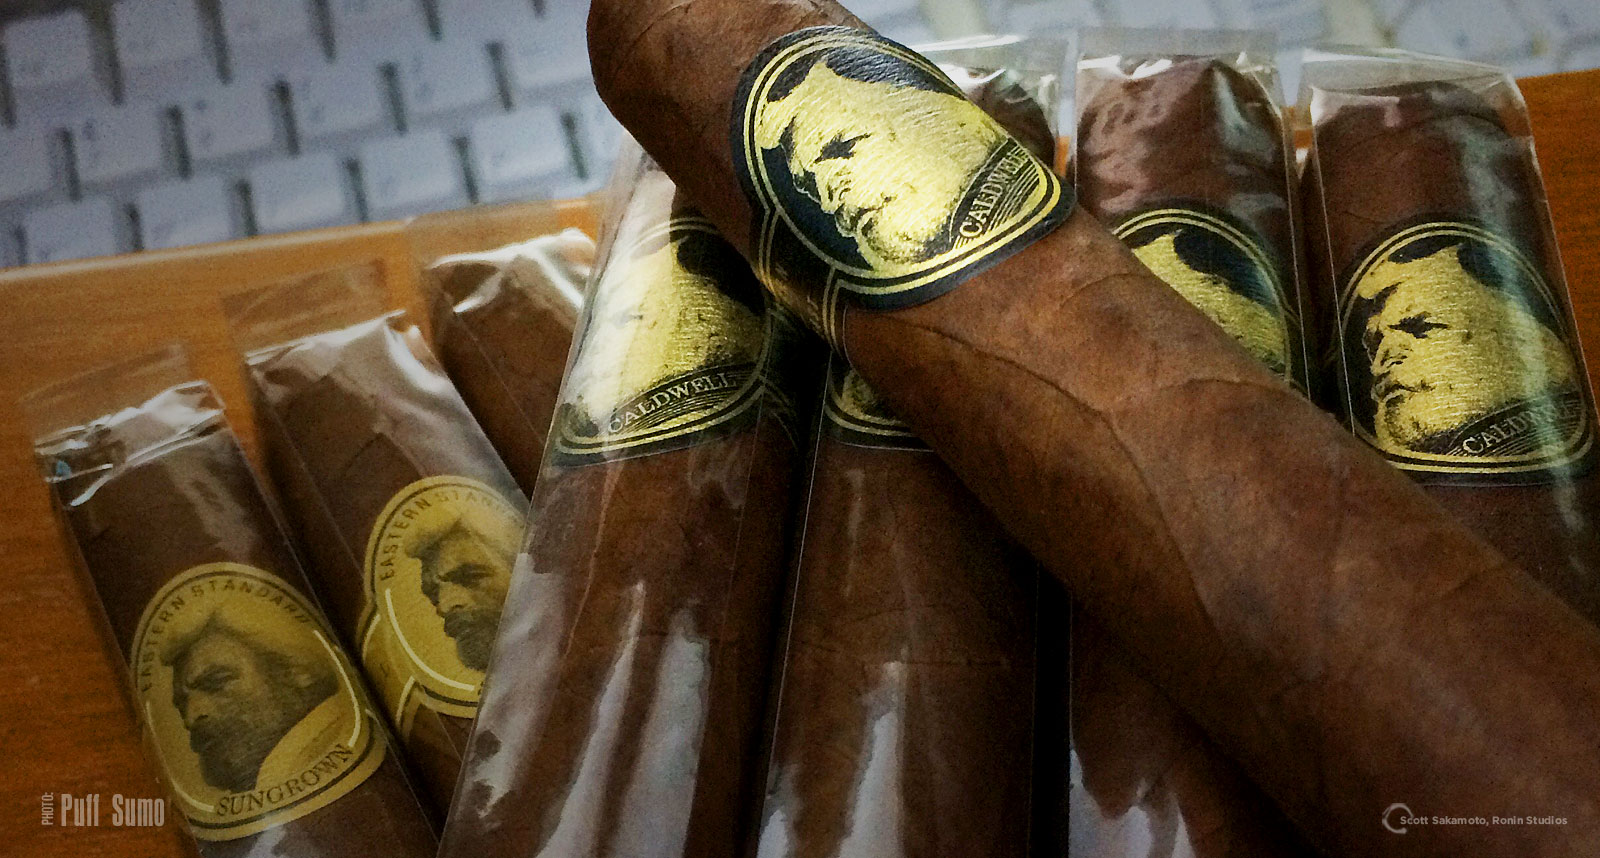 Arapiraca, Arapiraca Maduro, Caldwell Cigars, Connecticut-seed Arapiraca Maduro, Dominican Republic, Eastern Standard, Eastern Standard Midnight Express